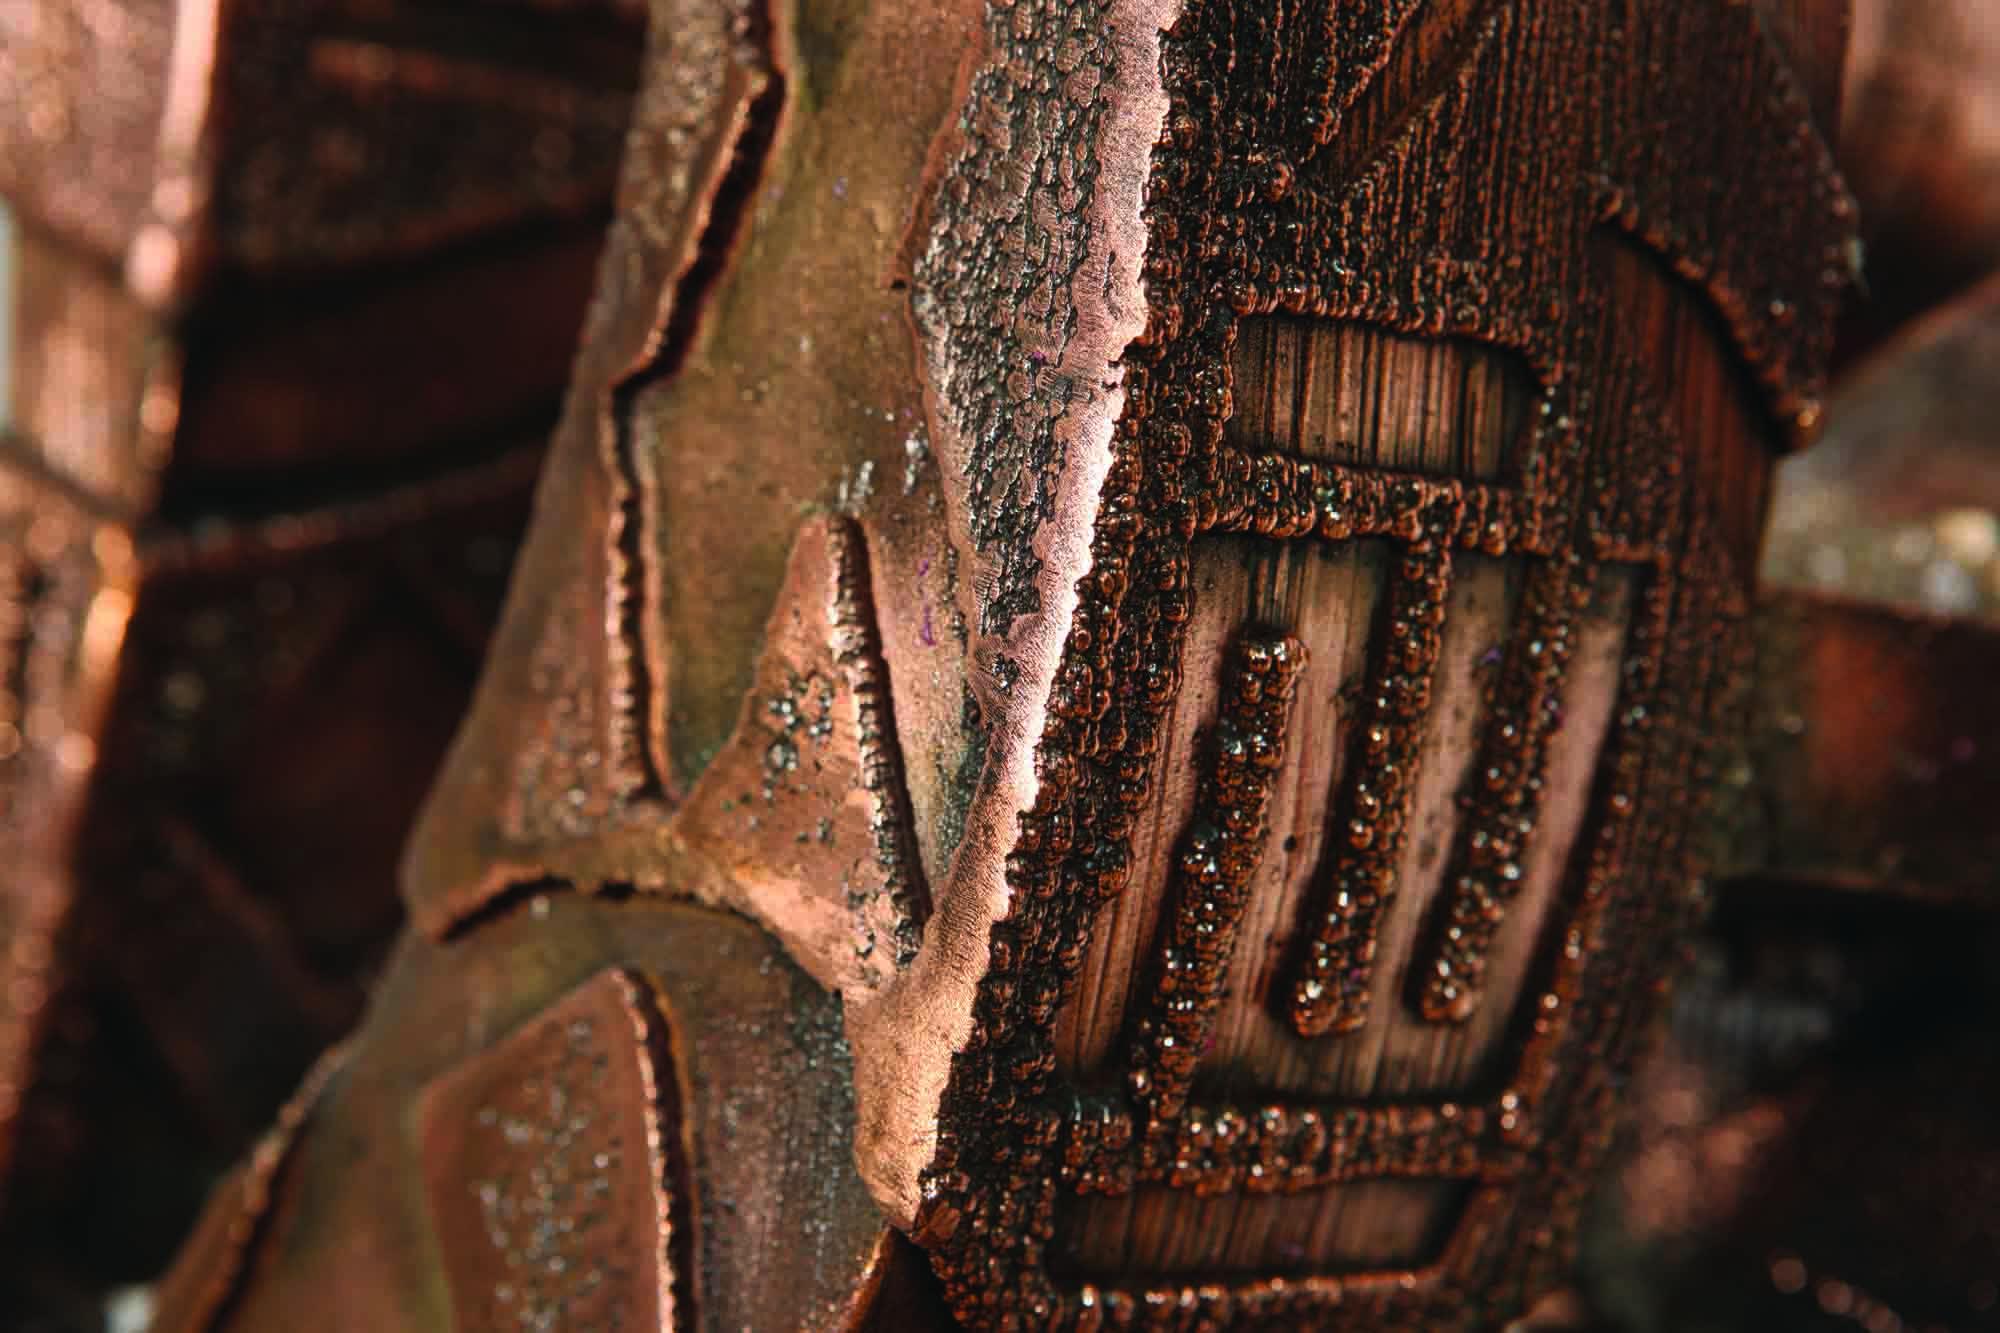 Amin Gulgee - Dragon Spider - detail (2014) | Copper; 251.5 x 79 x 81.5cm